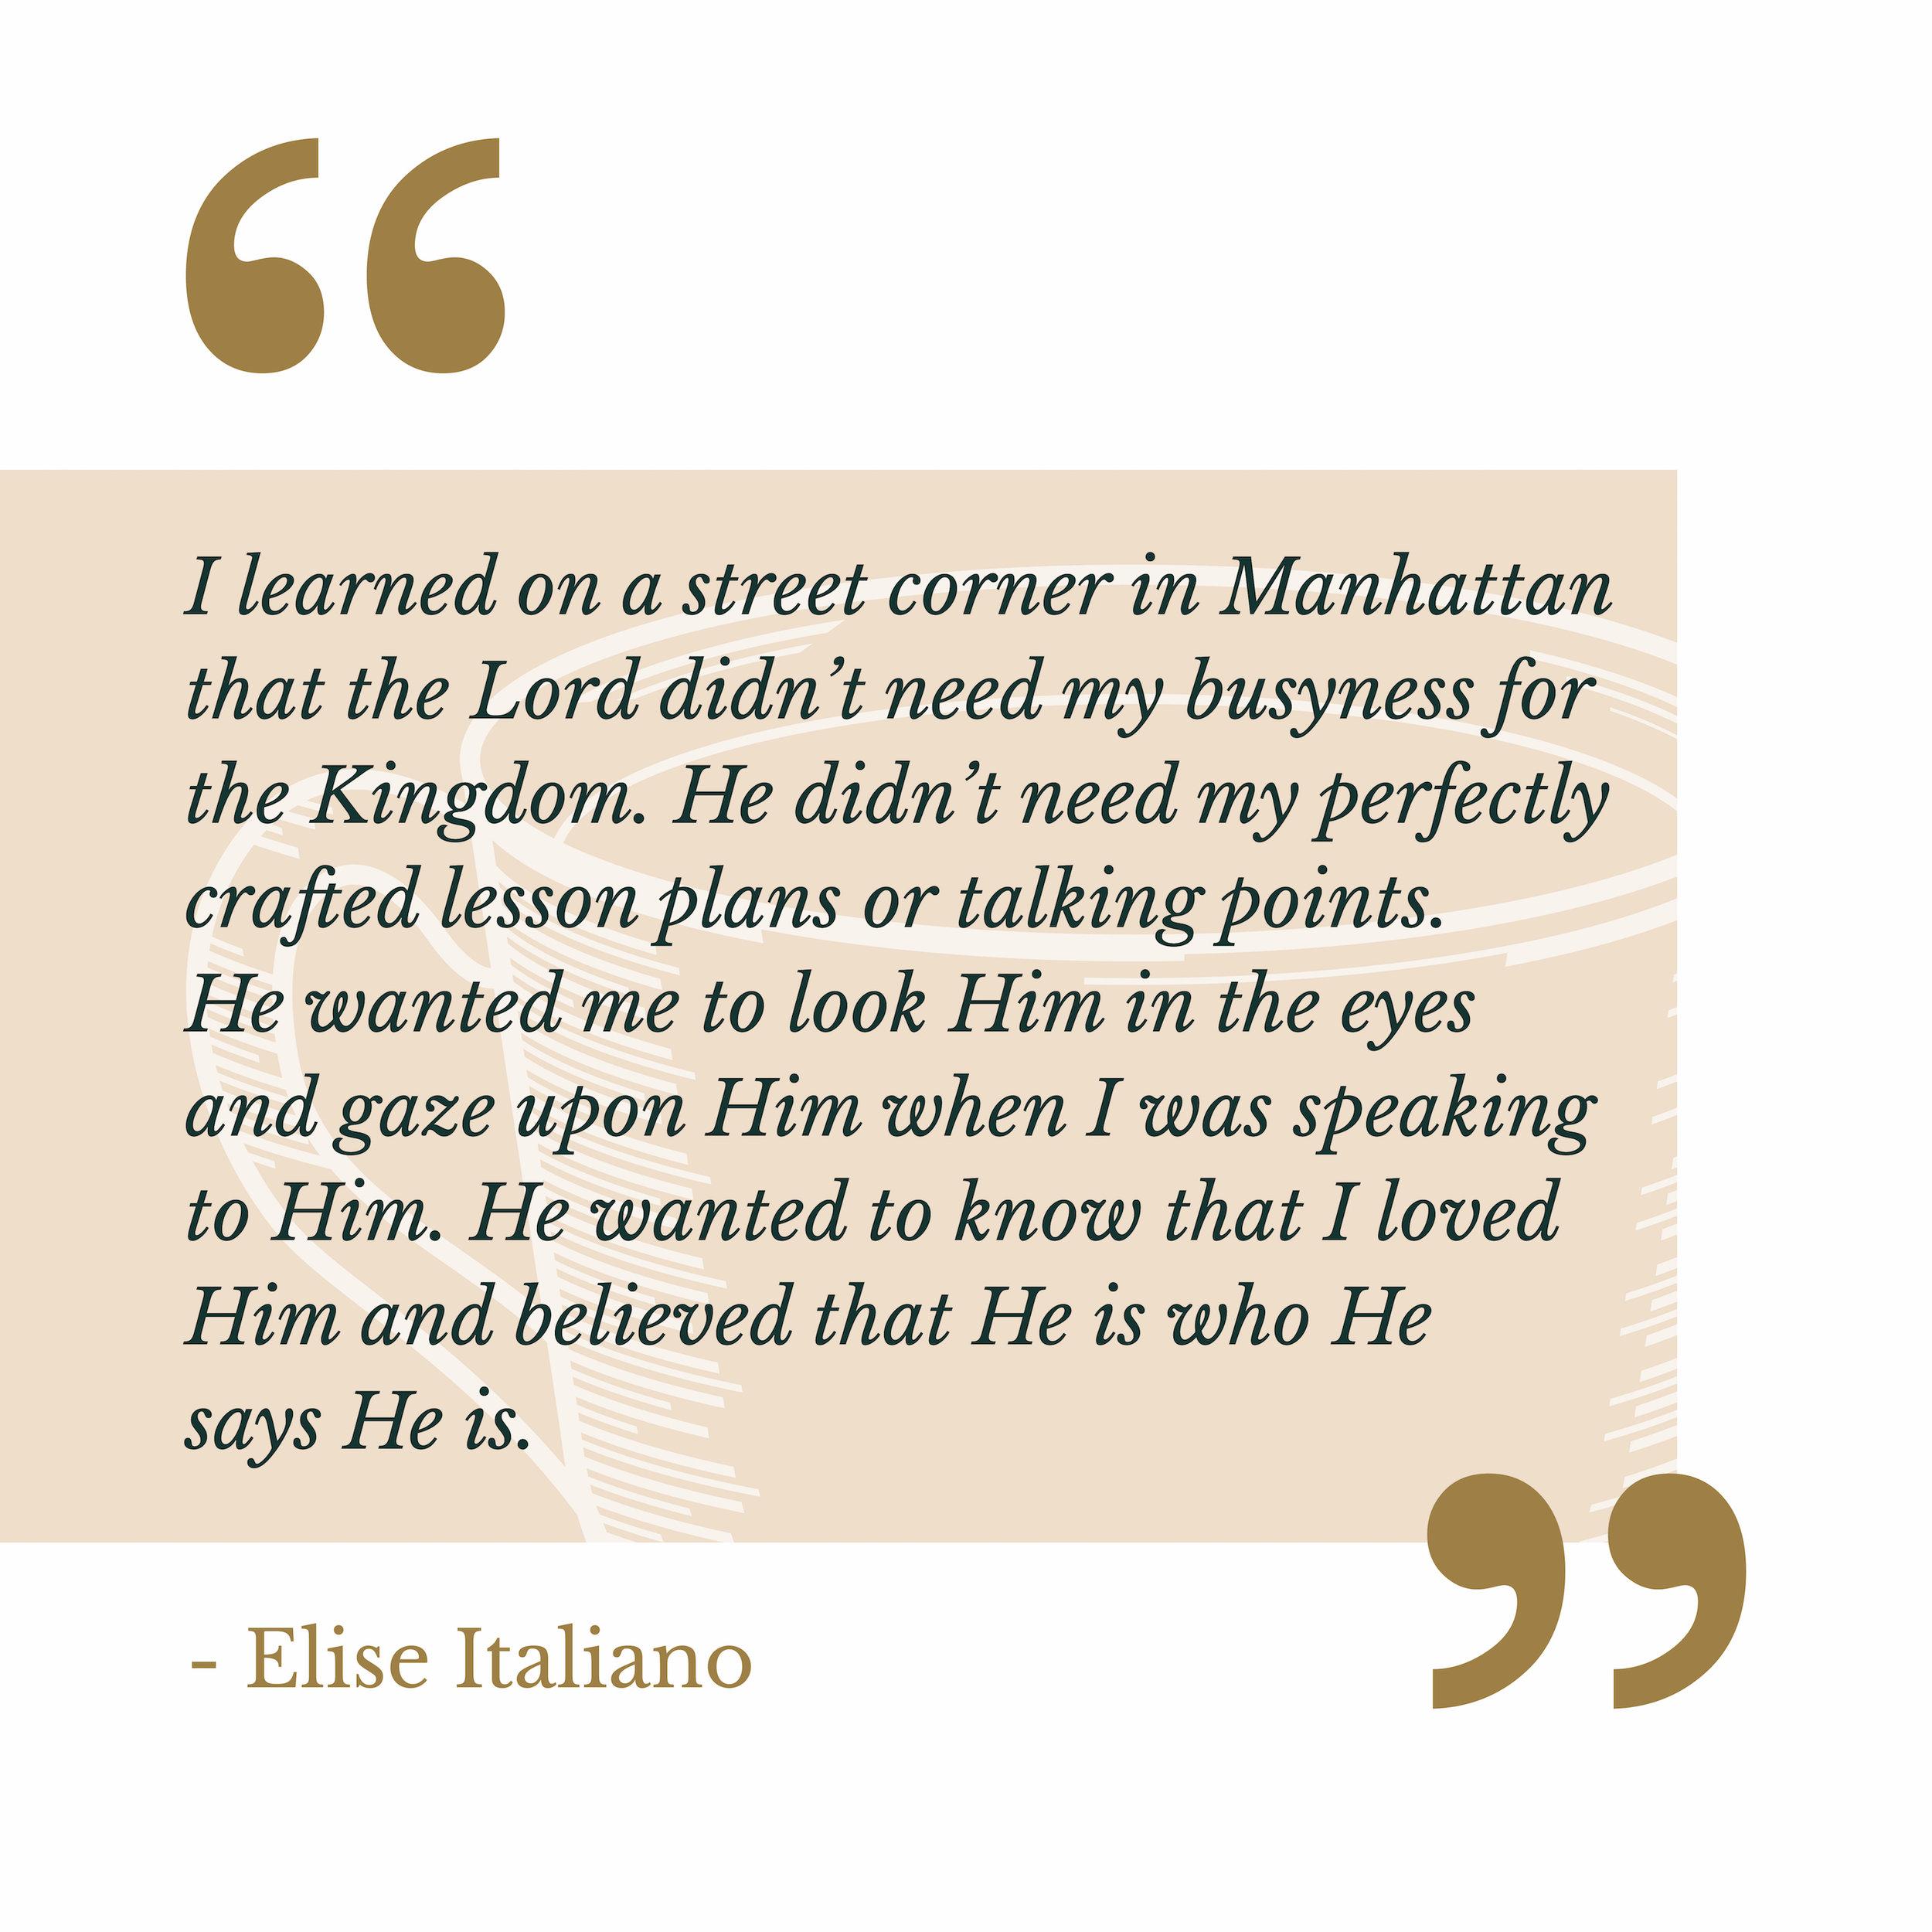 Elise Italiano via The Catholic Woman